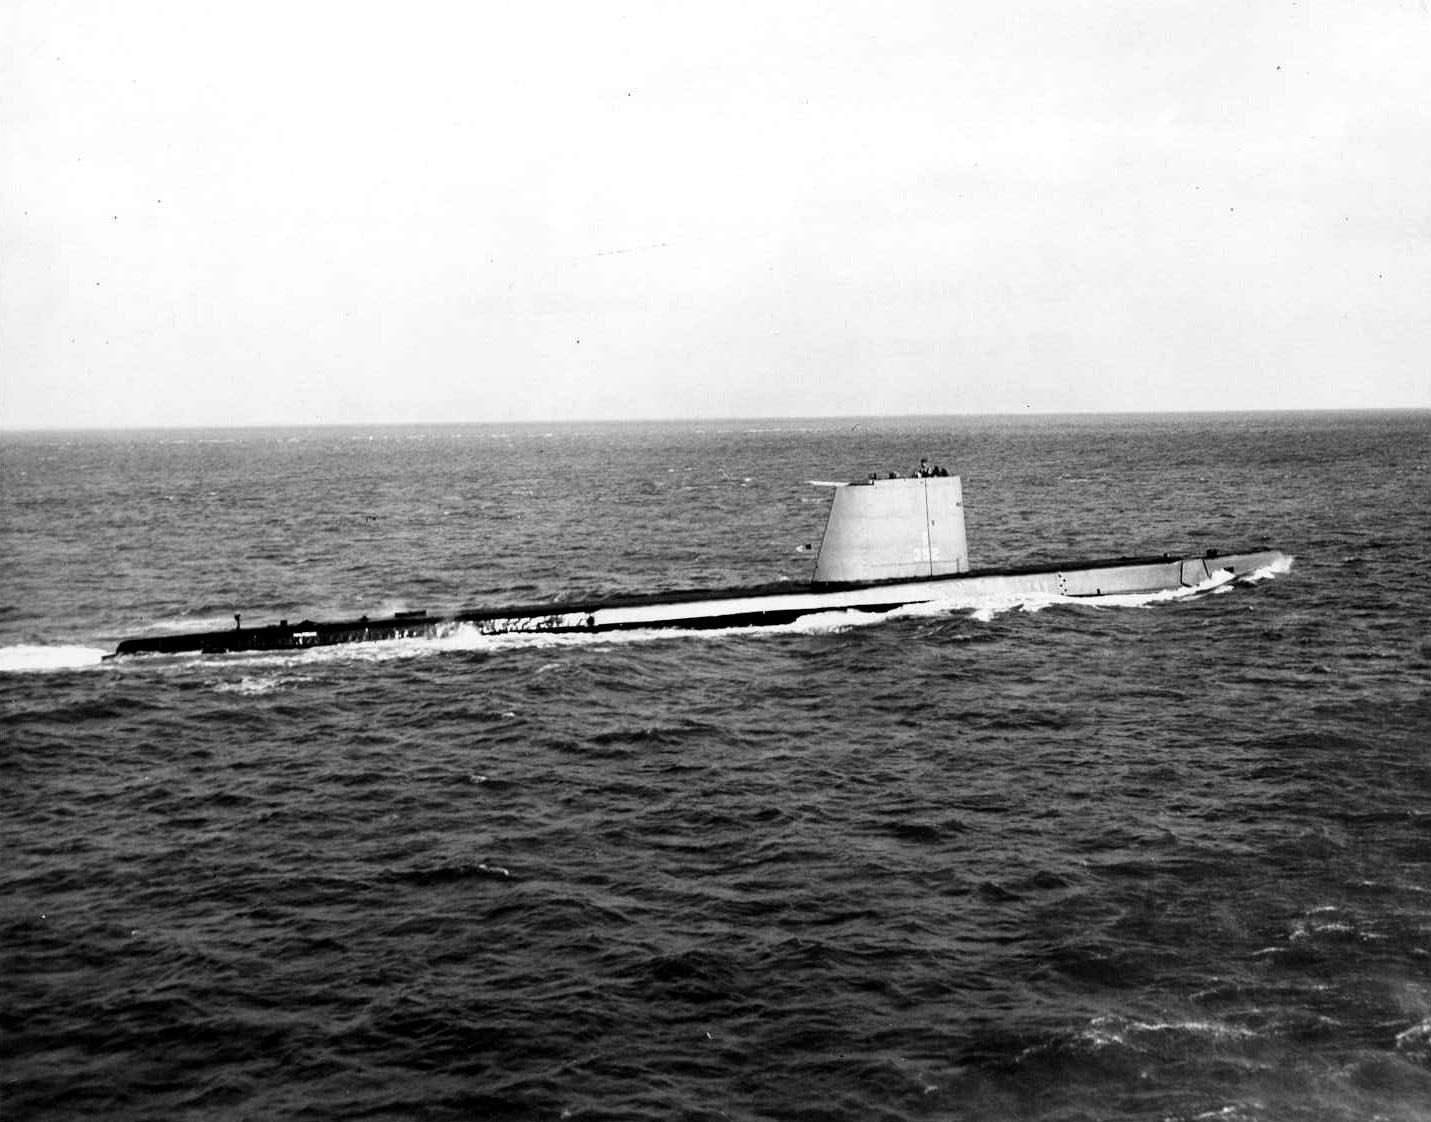 Halfbeak (SS-352), underway, 1967.